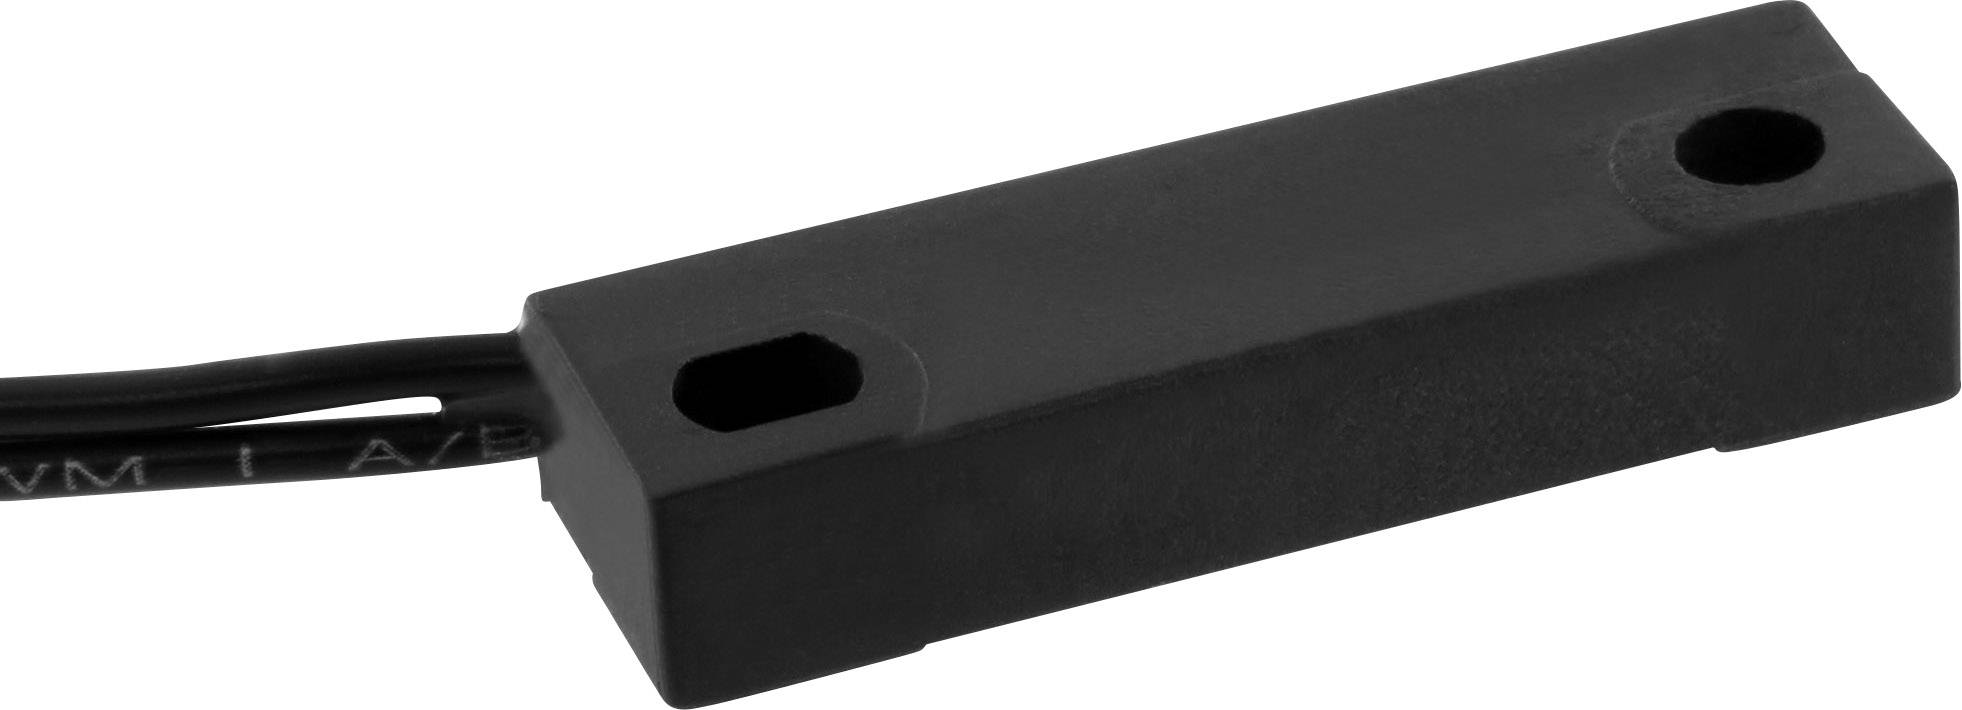 Jazyčkový kontakt StandexMeder Electronics 9263901054, 1 prepínací, 175 V/DC, 175 V/AC, 0.5 A, 10 W